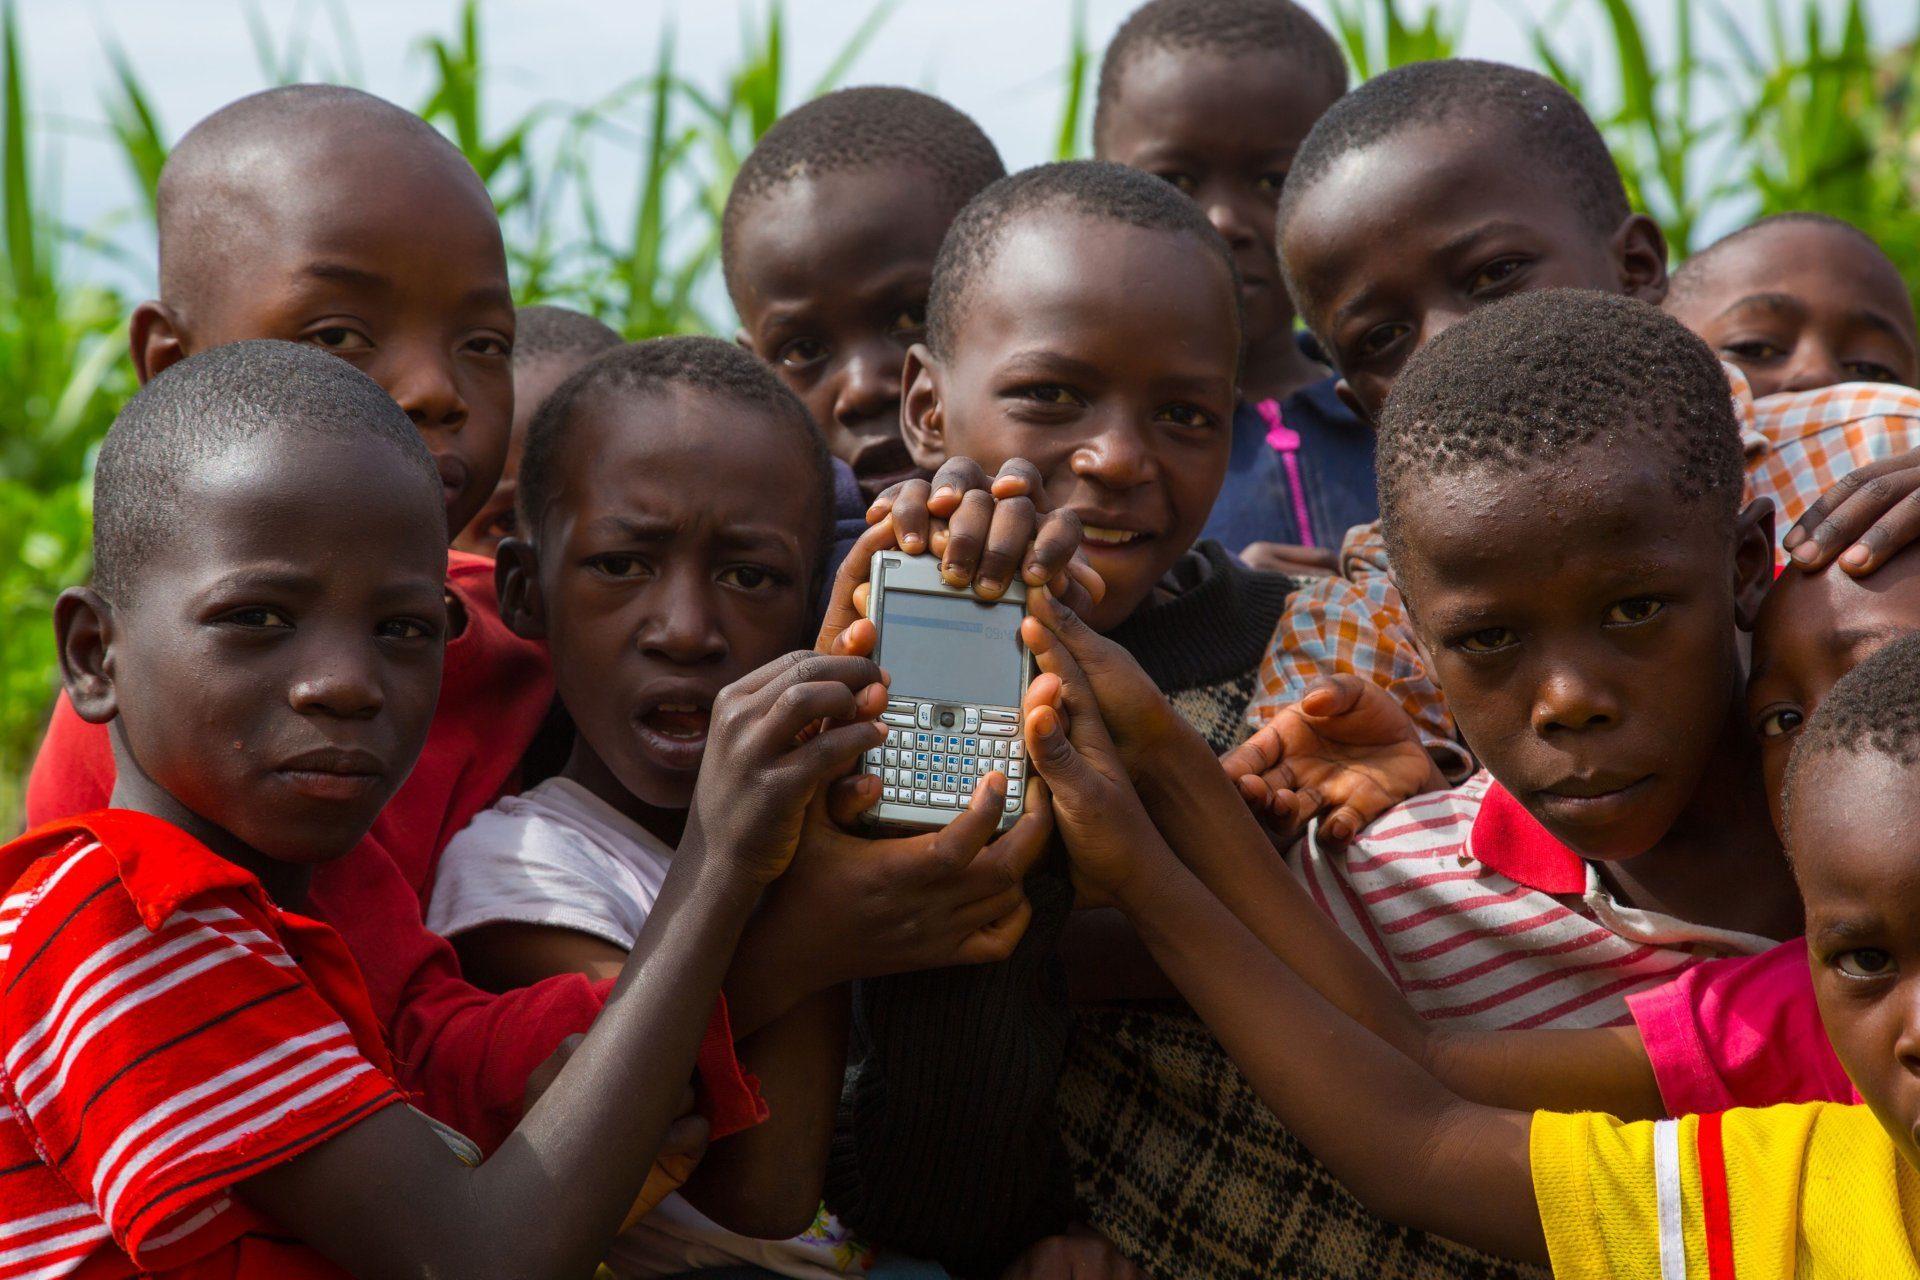 Image Kids with a mobile phone in Nairobi - Wikipedia Zero